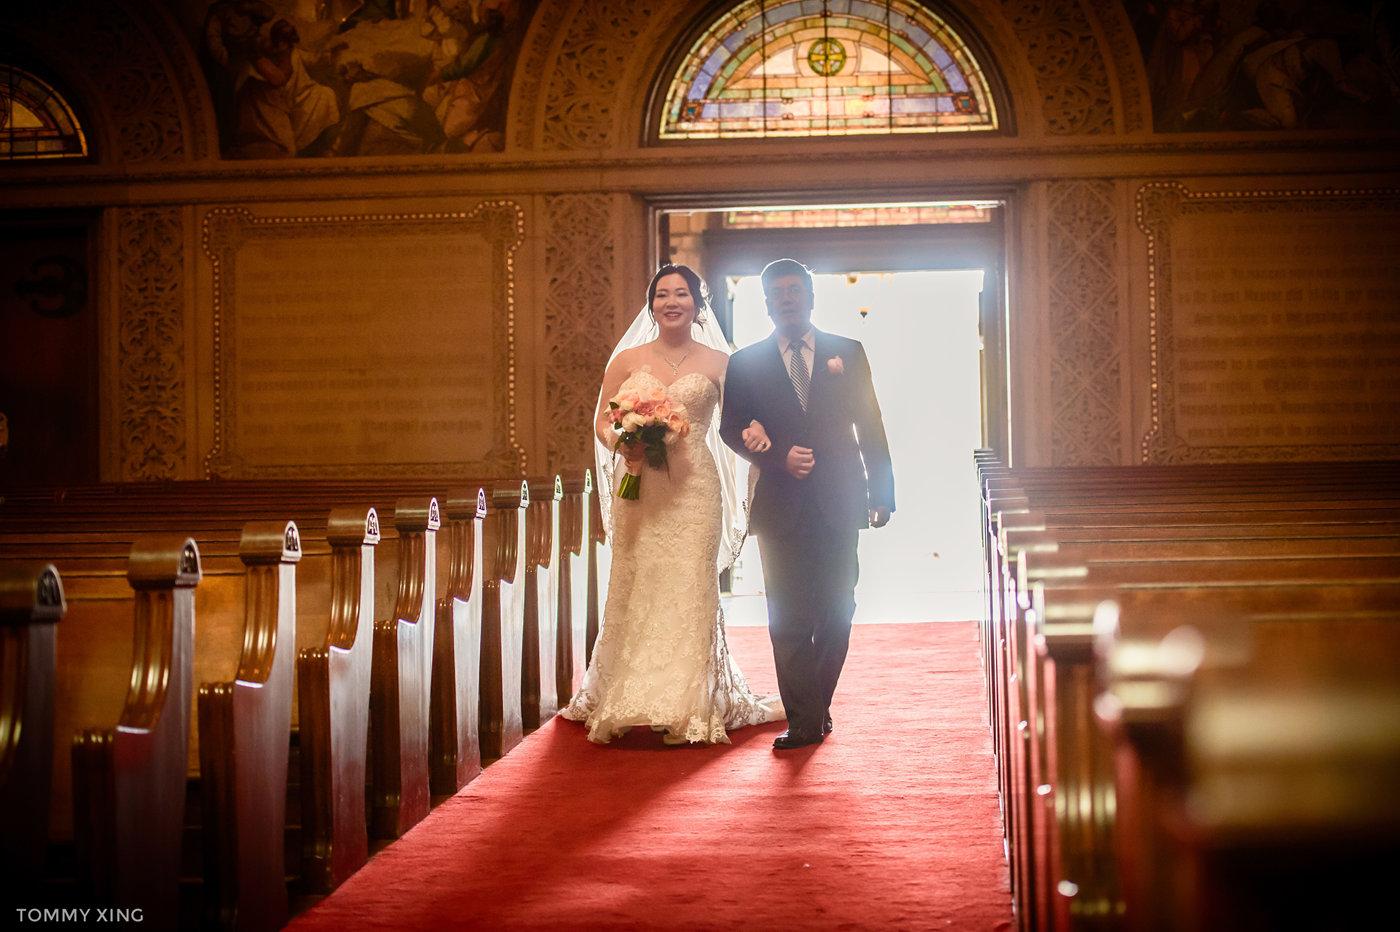 STANFORD MEMORIAL CHURCH WEDDING - Wenjie & Chengcheng - SAN FRANCISCO BAY AREA 斯坦福教堂婚礼跟拍 - 洛杉矶婚礼婚纱照摄影师 Tommy Xing Photography073.jpg